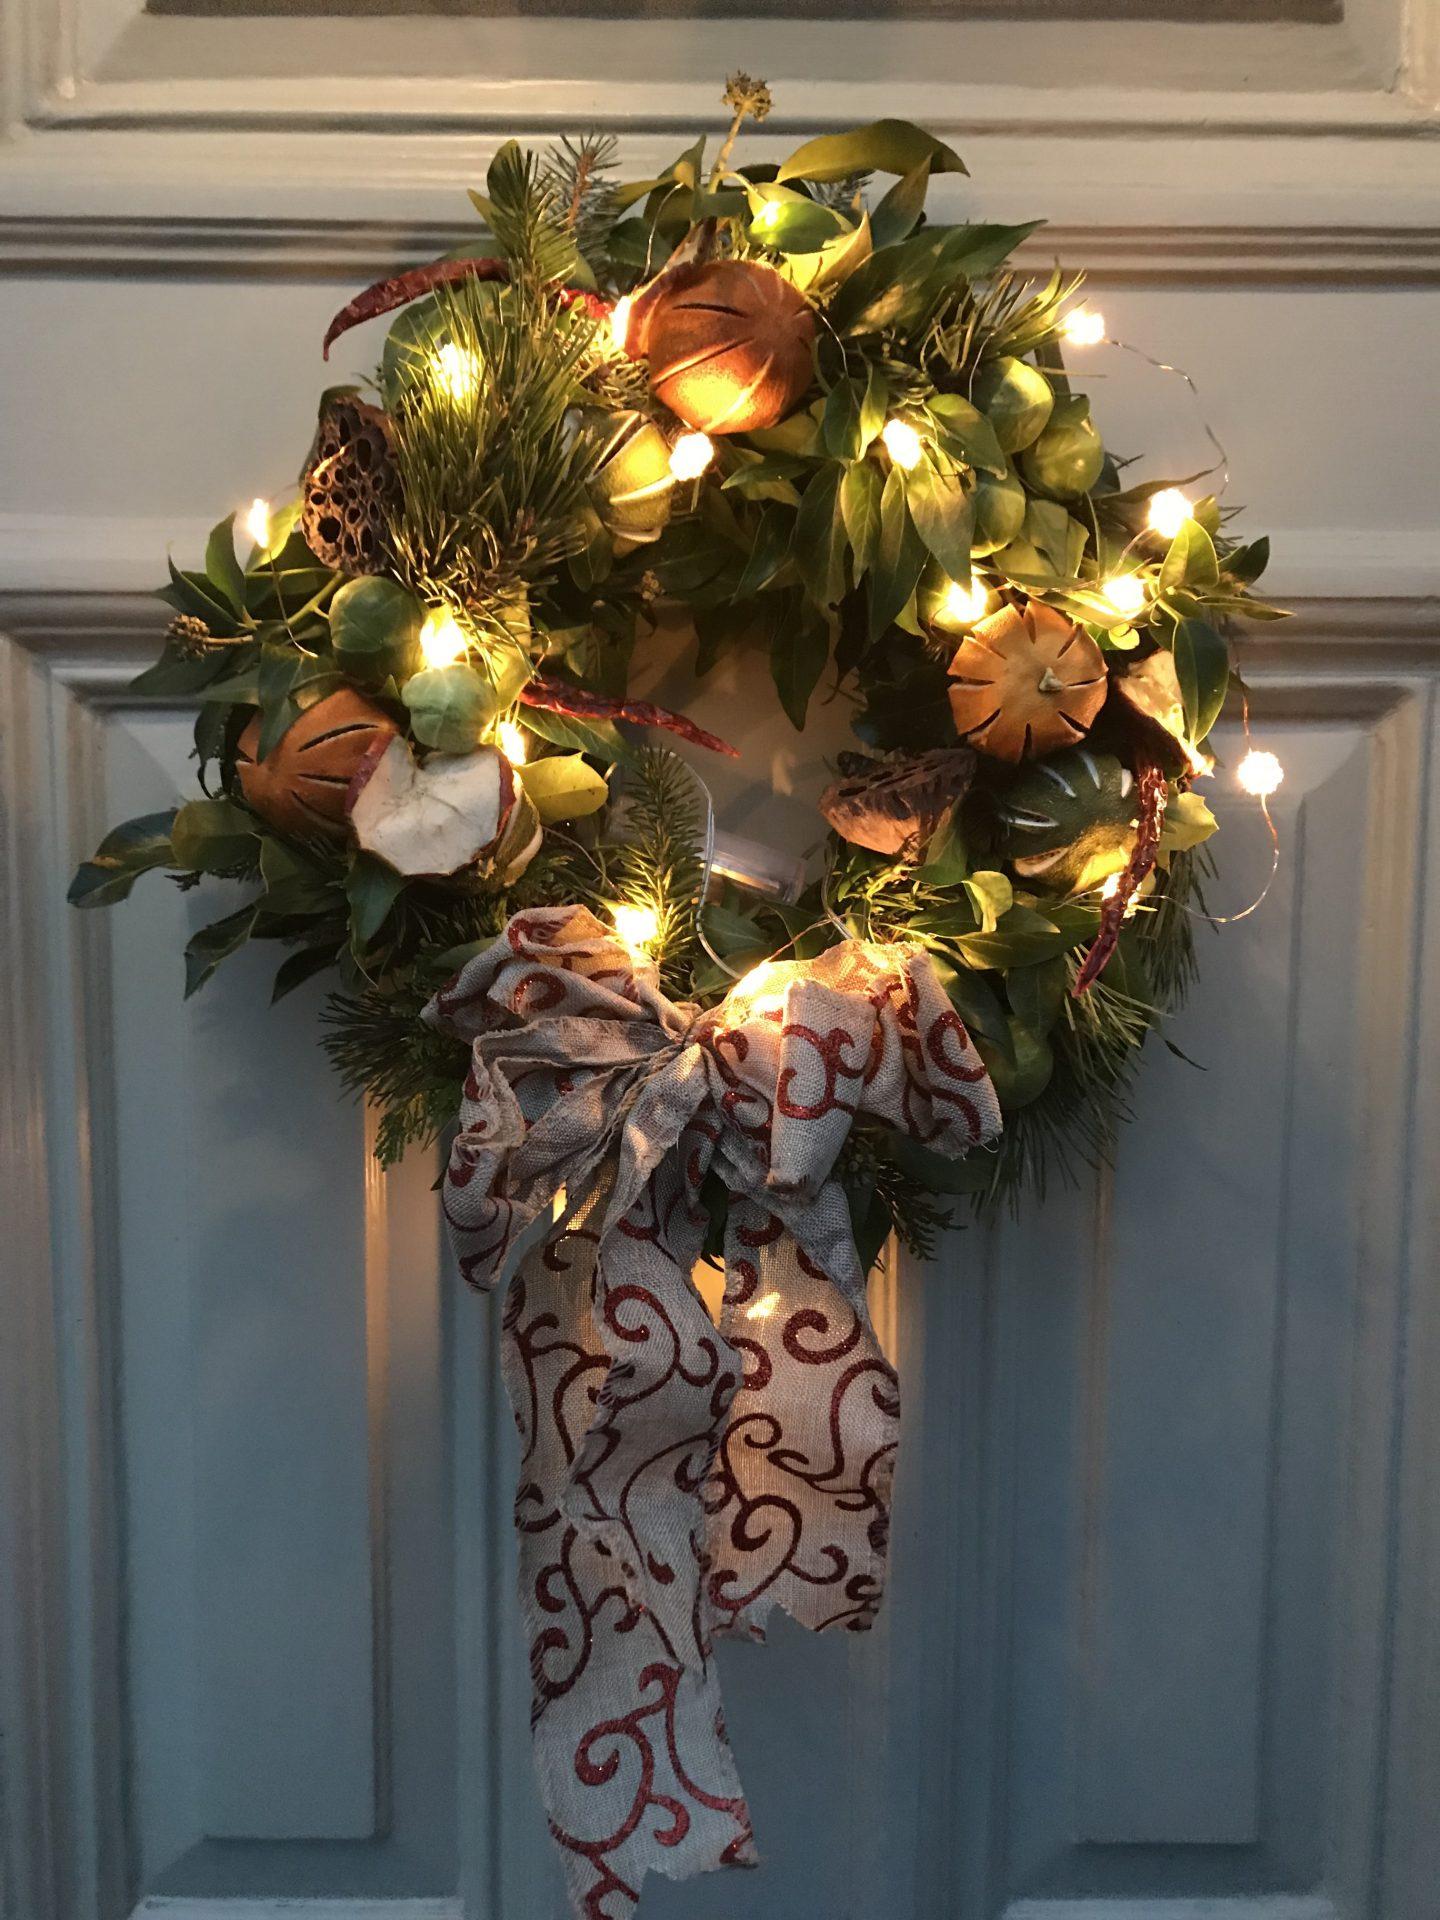 How _To _Make _A _Christmas _Wreath